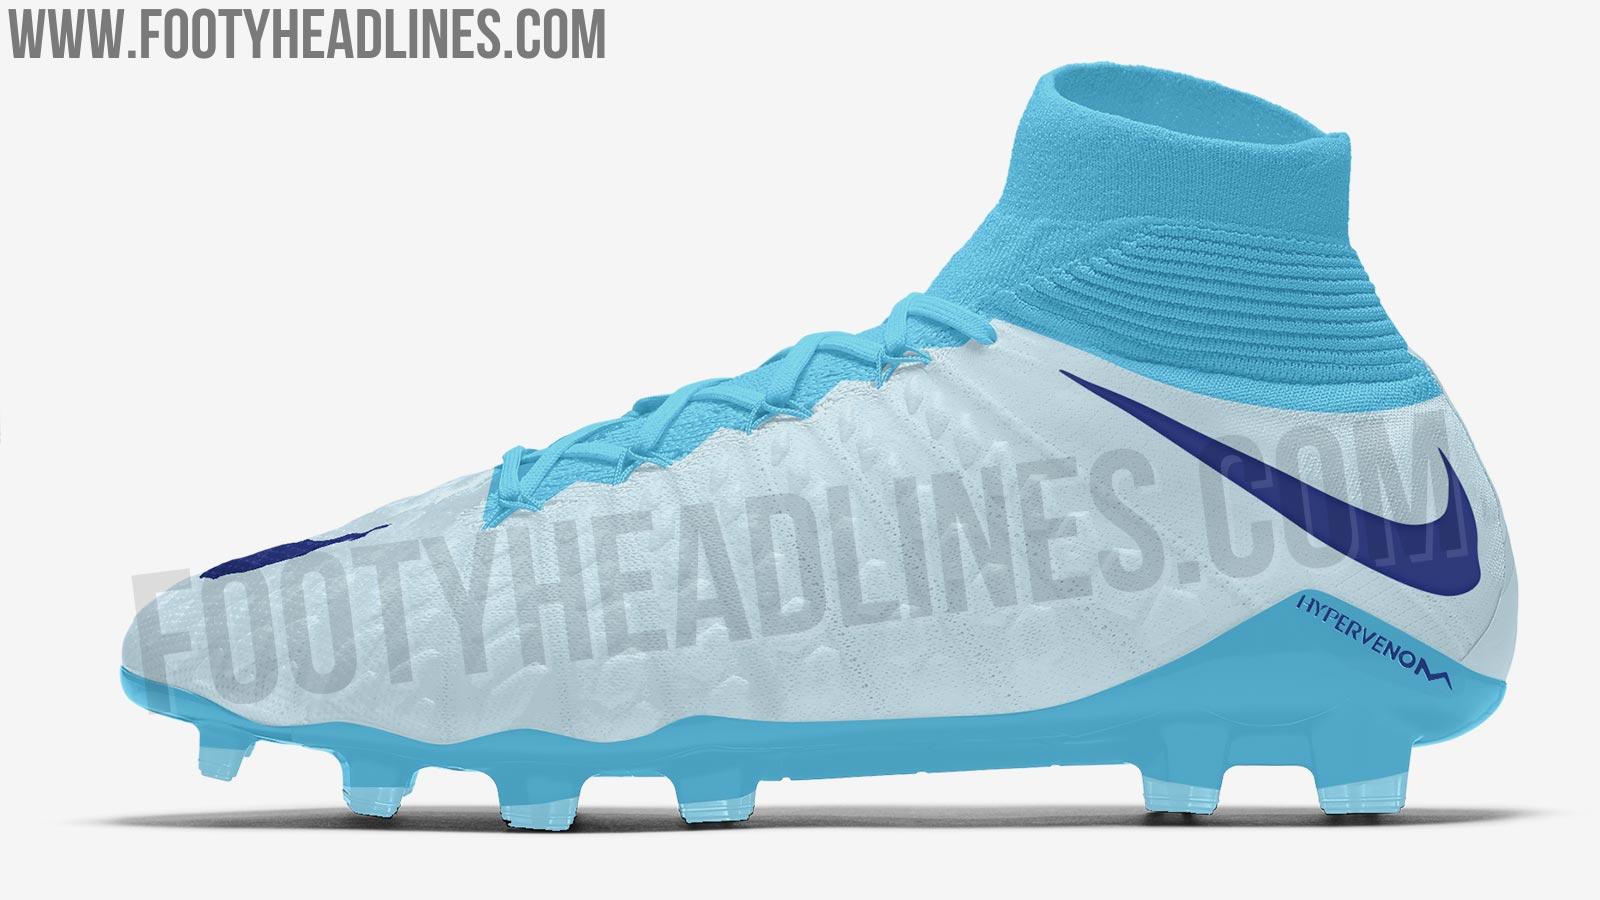 e9f22923fb21 Glacier Blue  Nike Hypervenom Phantom III 2018 Boots Leaked